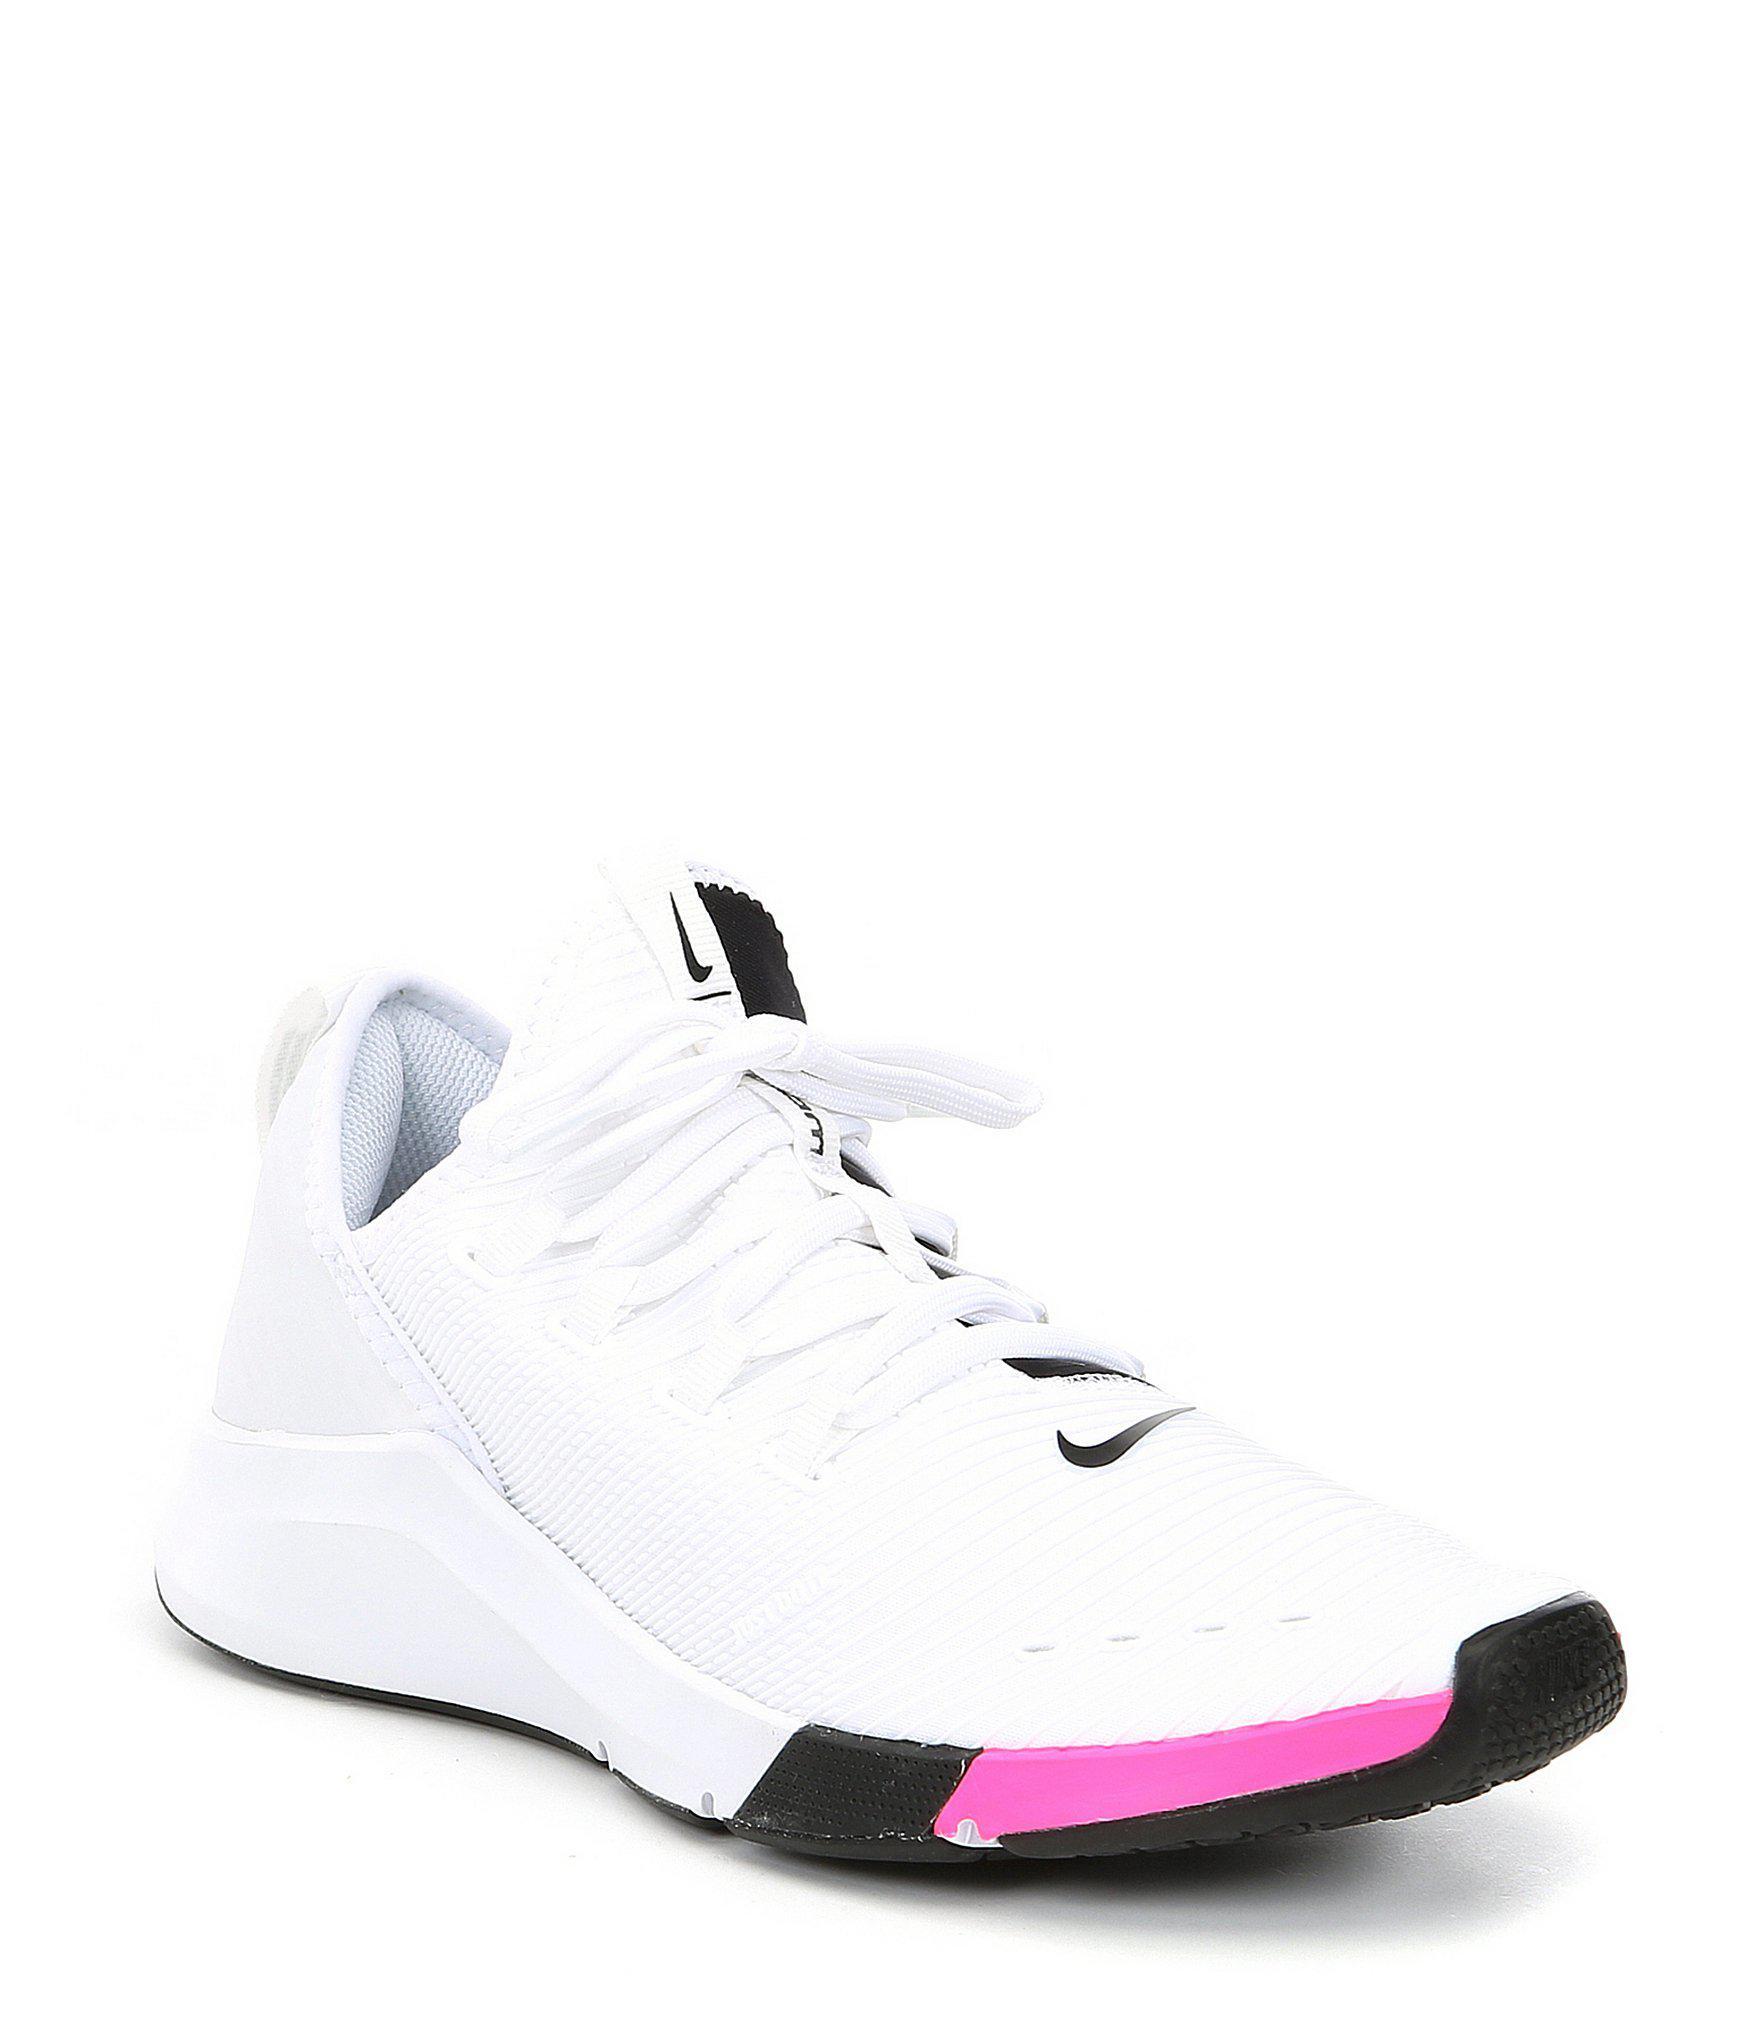 98eef85bd4193 Lyst - Nike Women s Air Zoom Fitness 2 Training Shoe in White